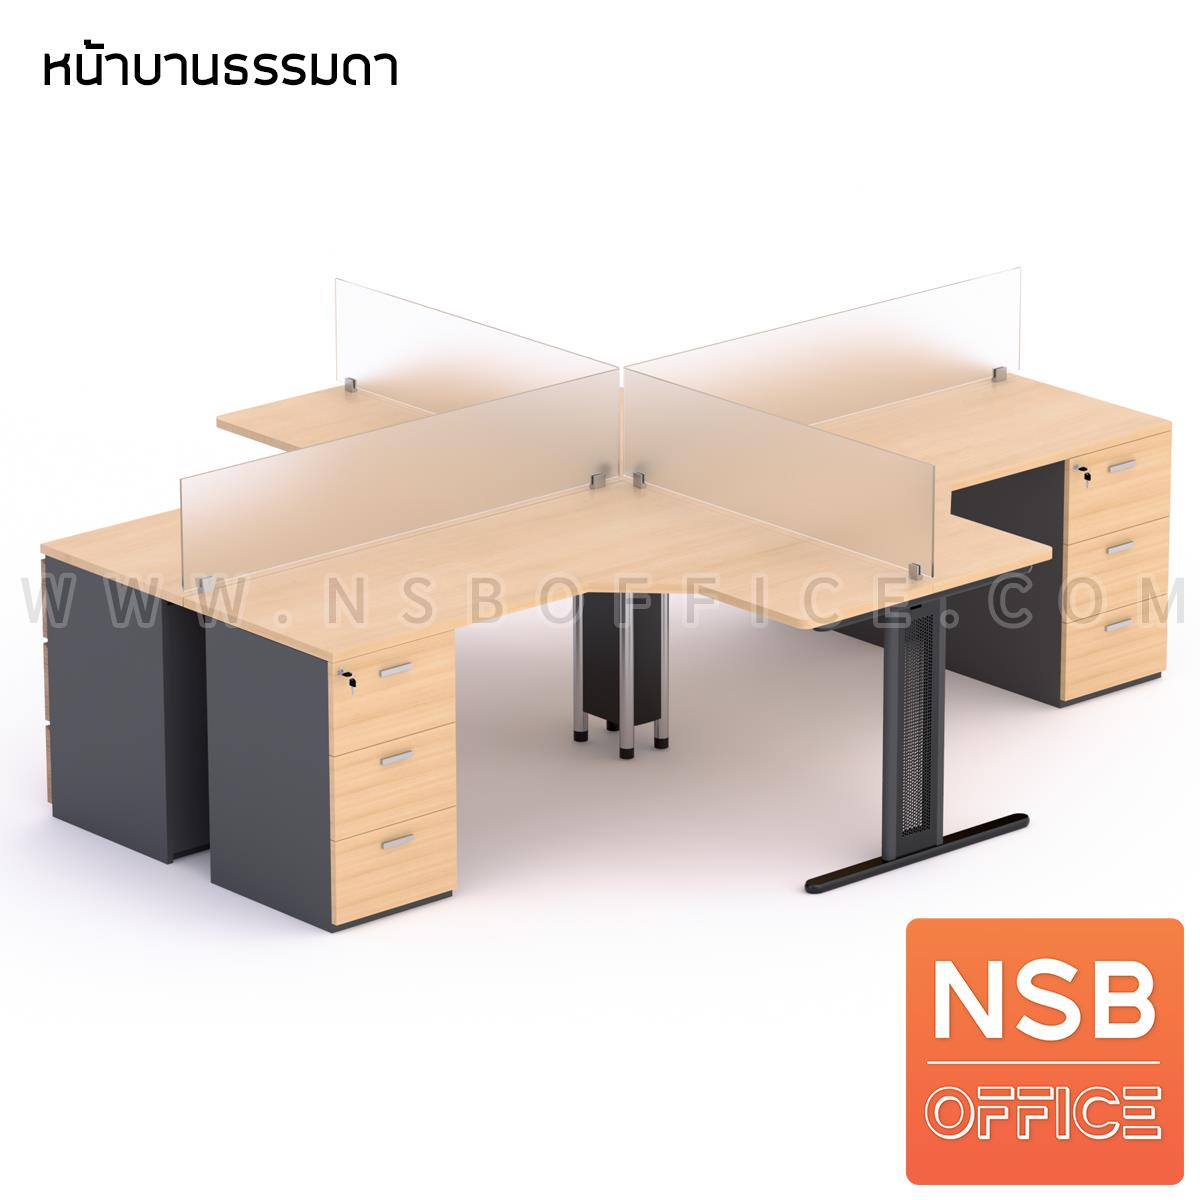 A04A166:ชุดโต๊ะทำงานกลุ่มตัวแอล 4 ที่นั่ง   ขนาด 150W1*120W2 cm. ต่อที่นั่ง พร้อม 3 ลิ้นชัก